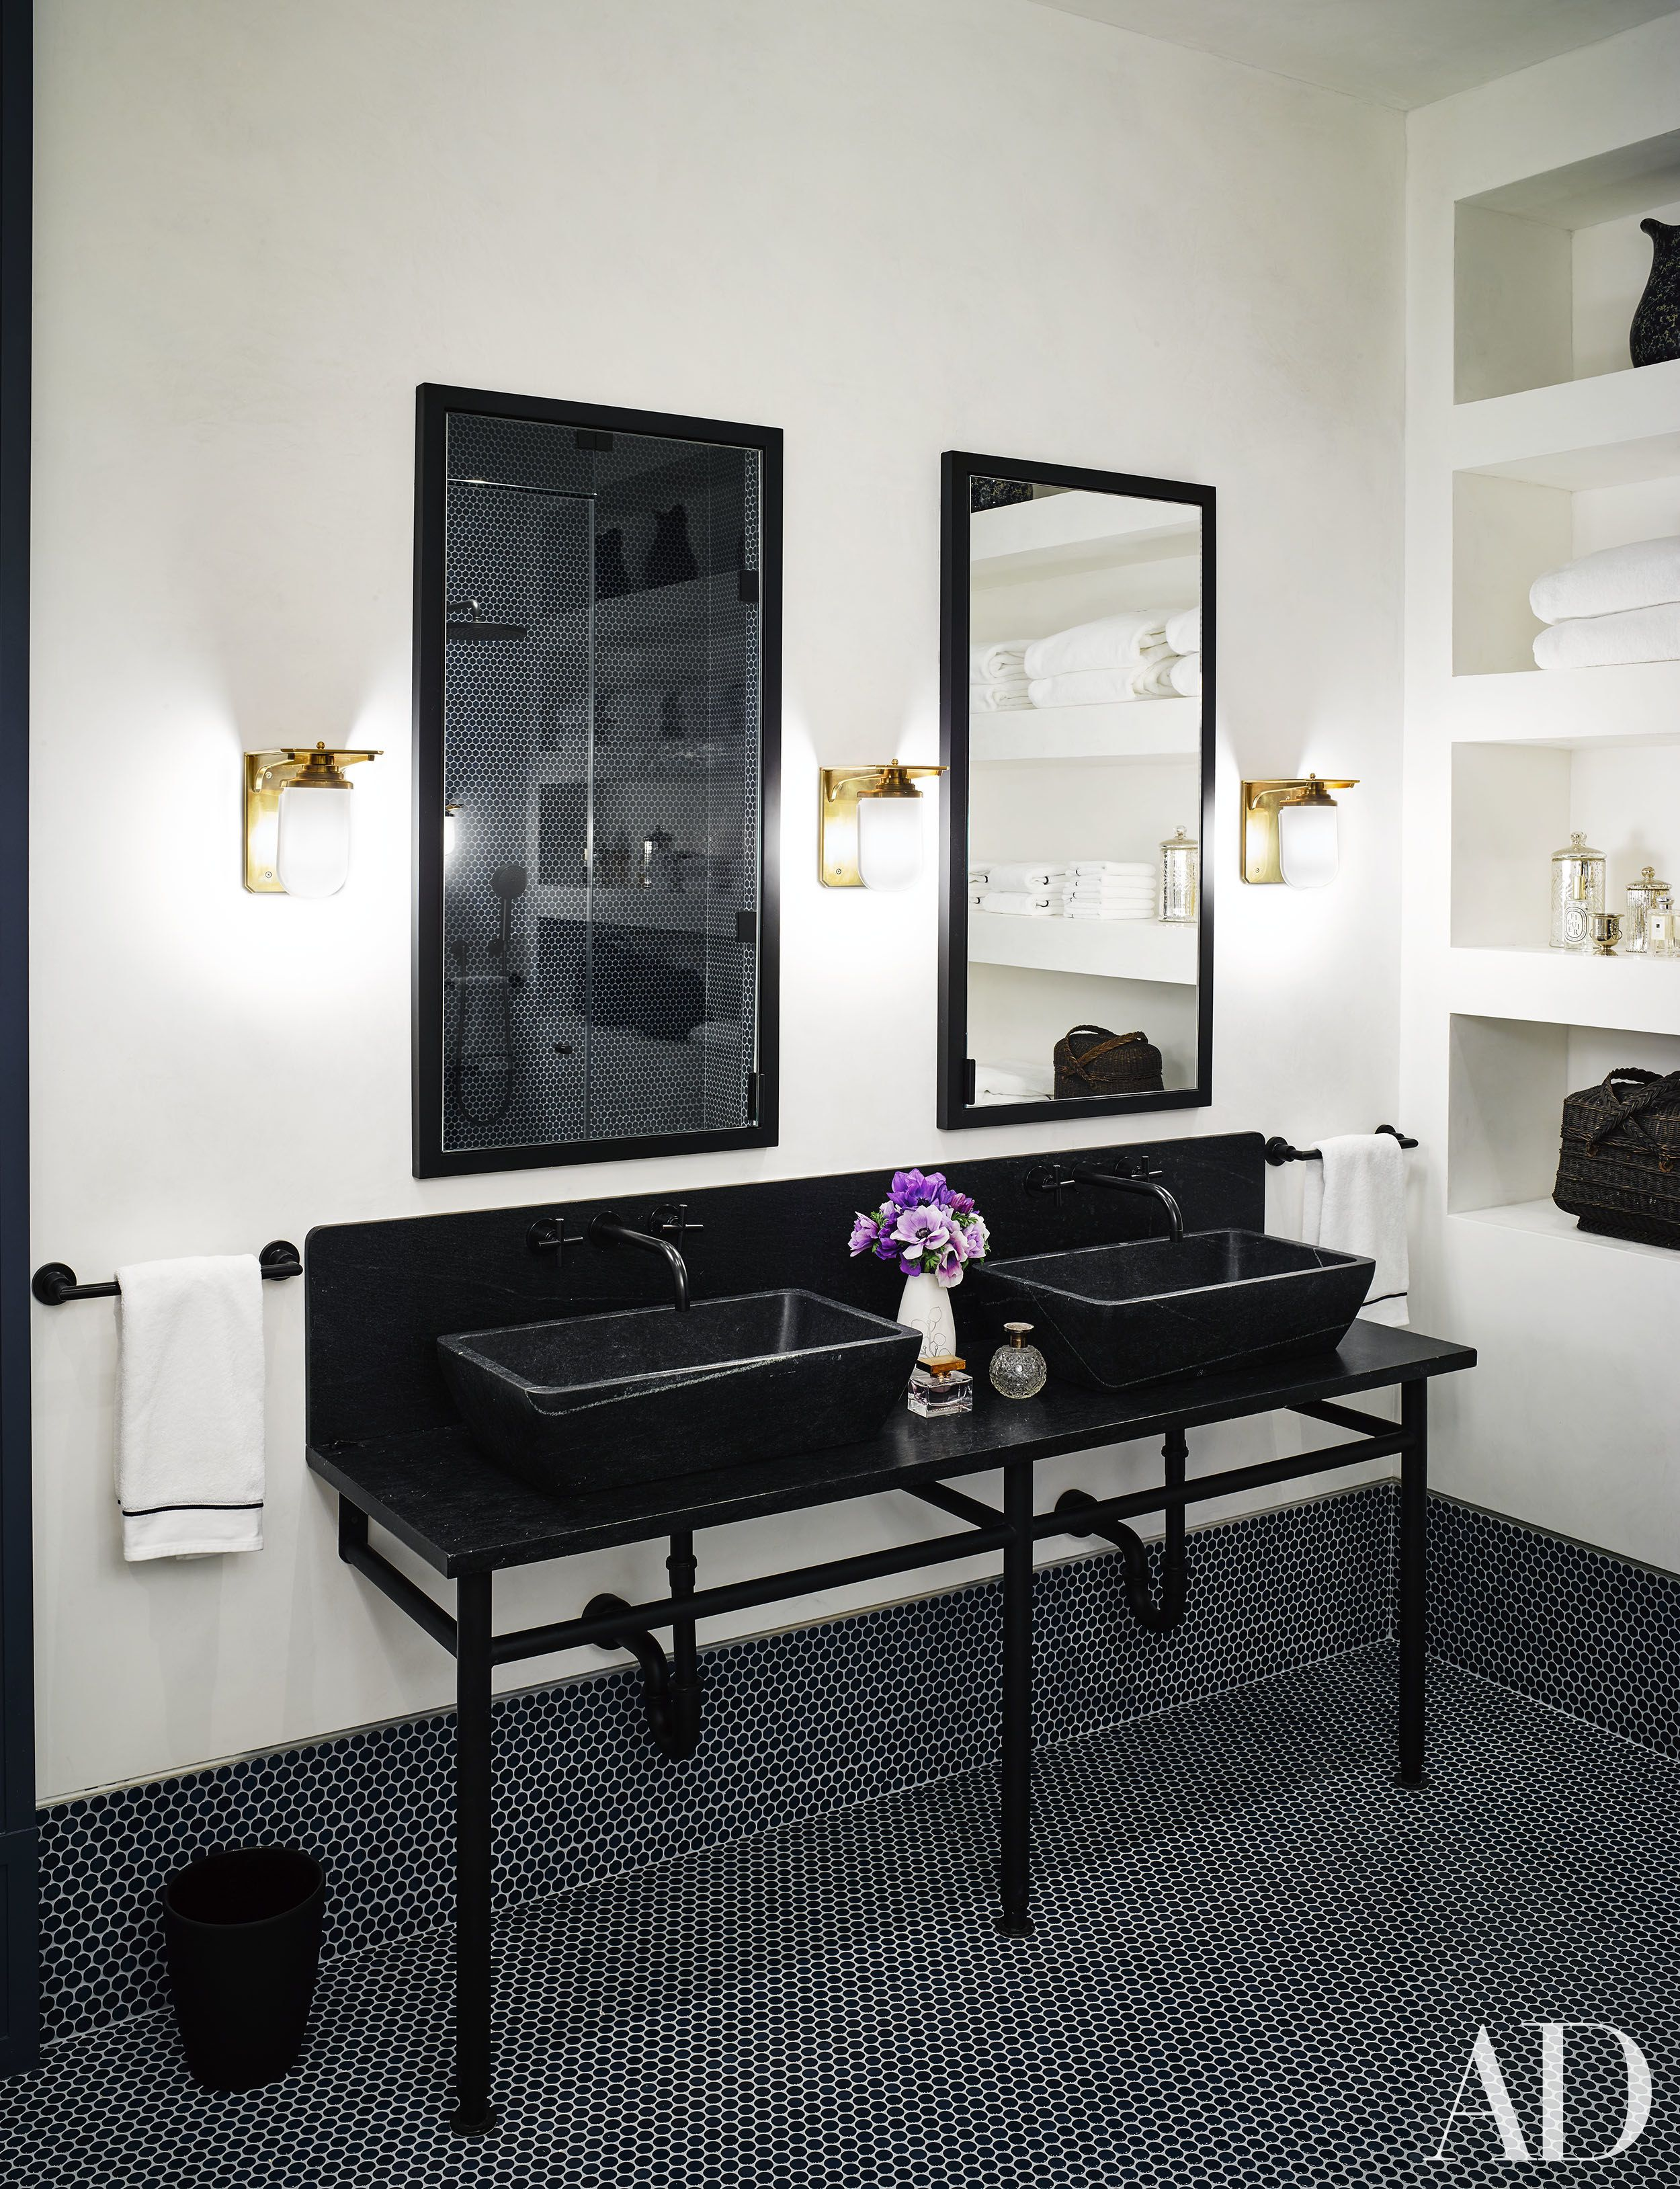 Naomi Watts And Liev Schreiber's Stunning New York City Apartment Photos   Architectural Digest